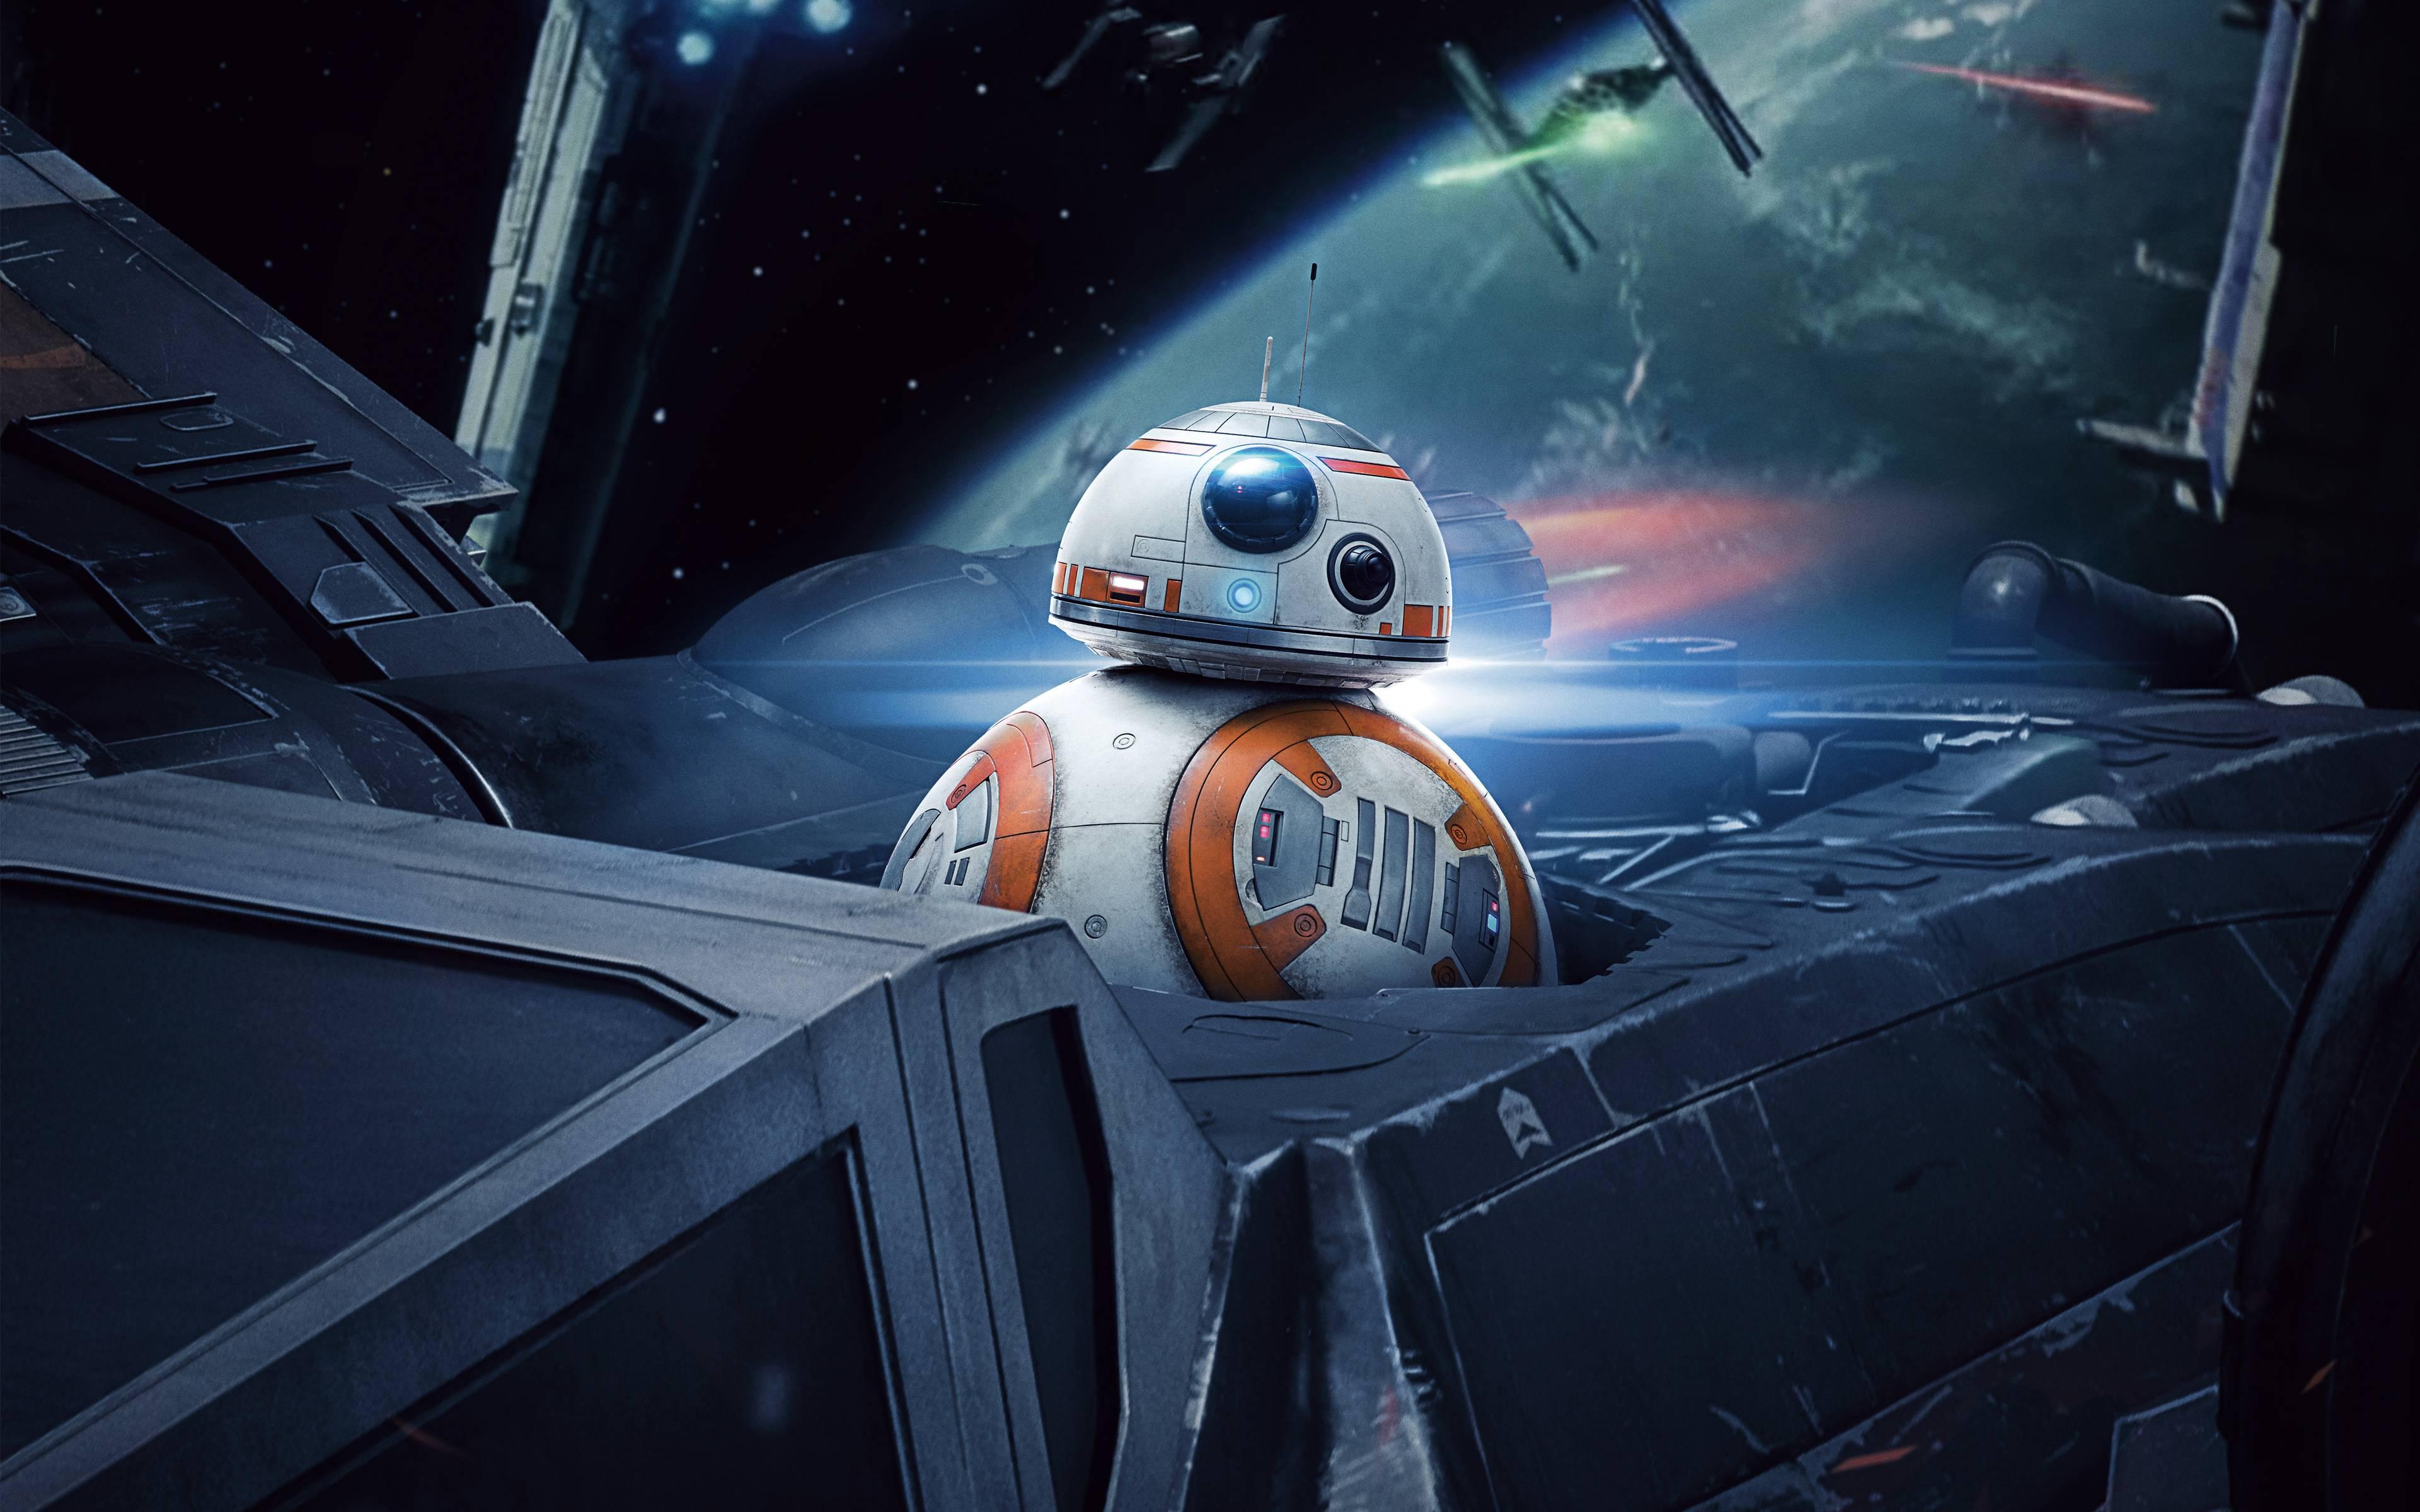 Star Wars Ultra Hd Wallpapers Top Free Star Wars Ultra Hd Backgrounds Wallpaperaccess